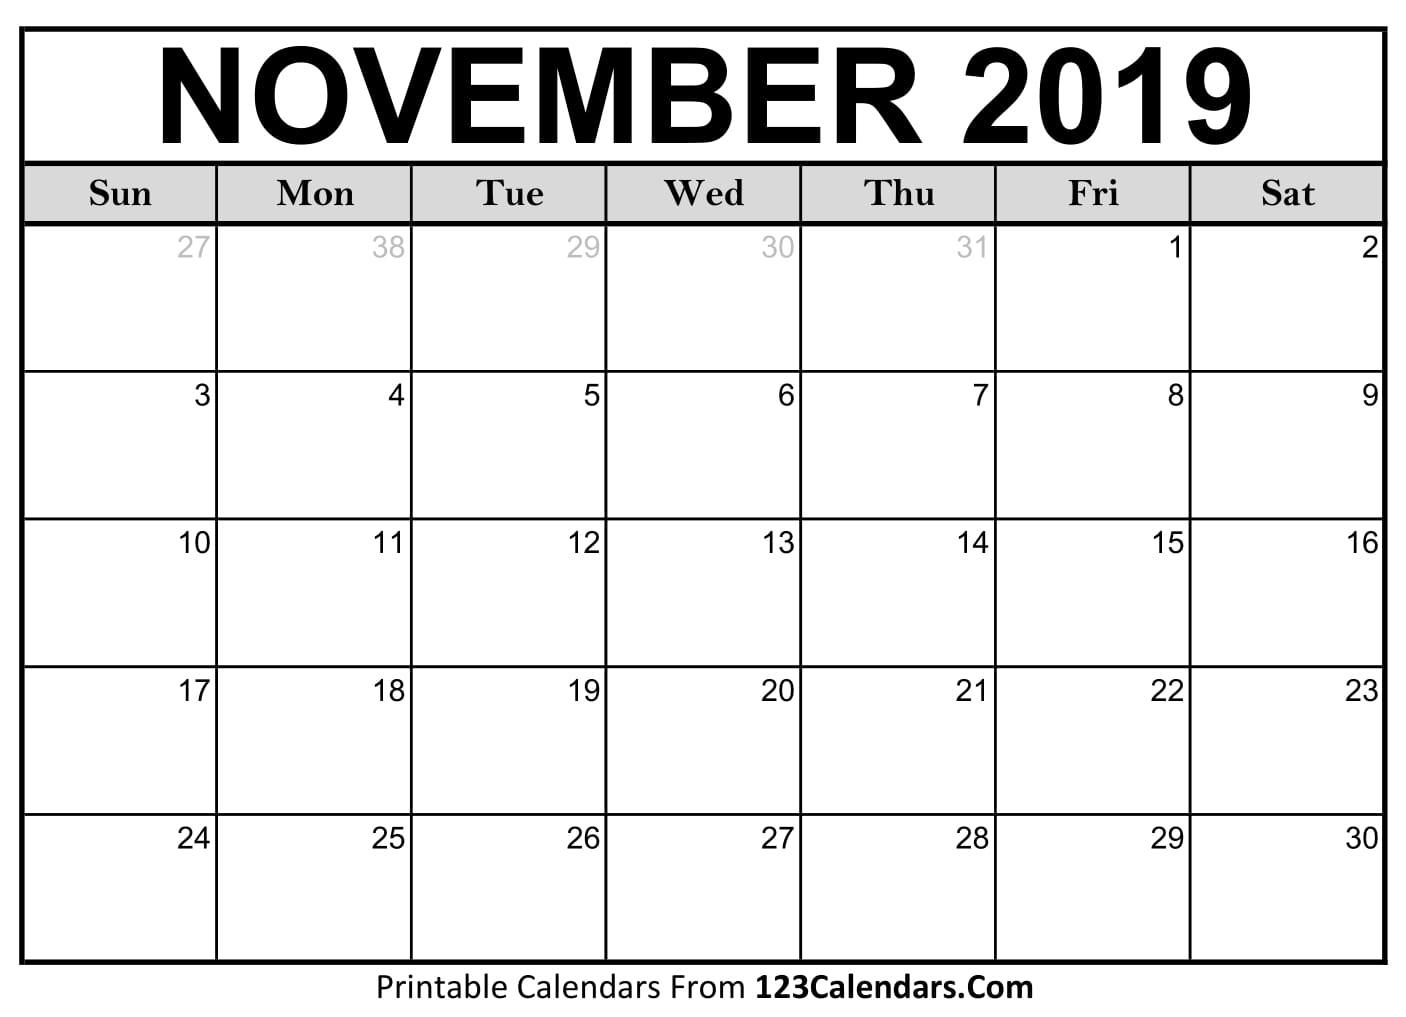 November 2019 Printable Calendar | 123Calendars